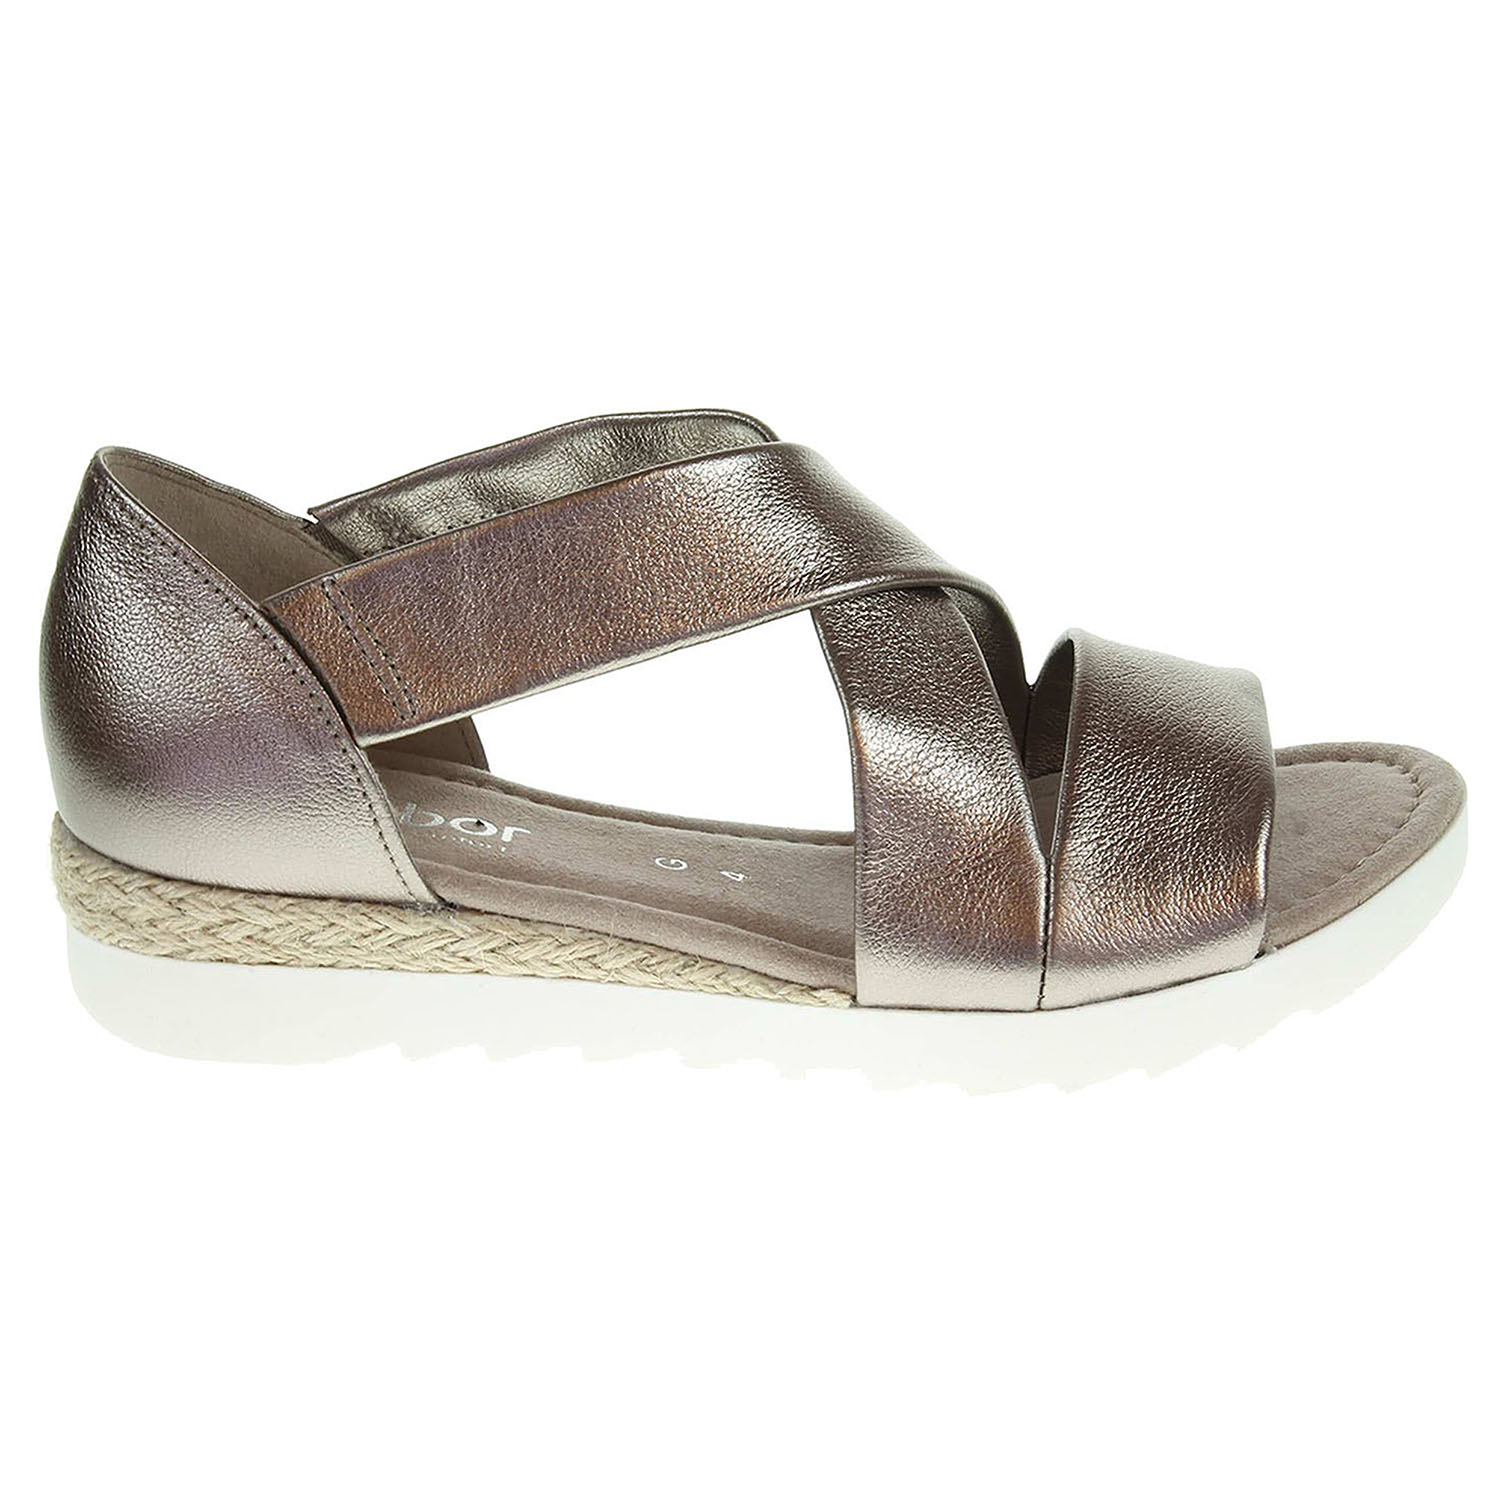 Ecco Gabor dámské sandály 62.711.64 bronzové 23800963